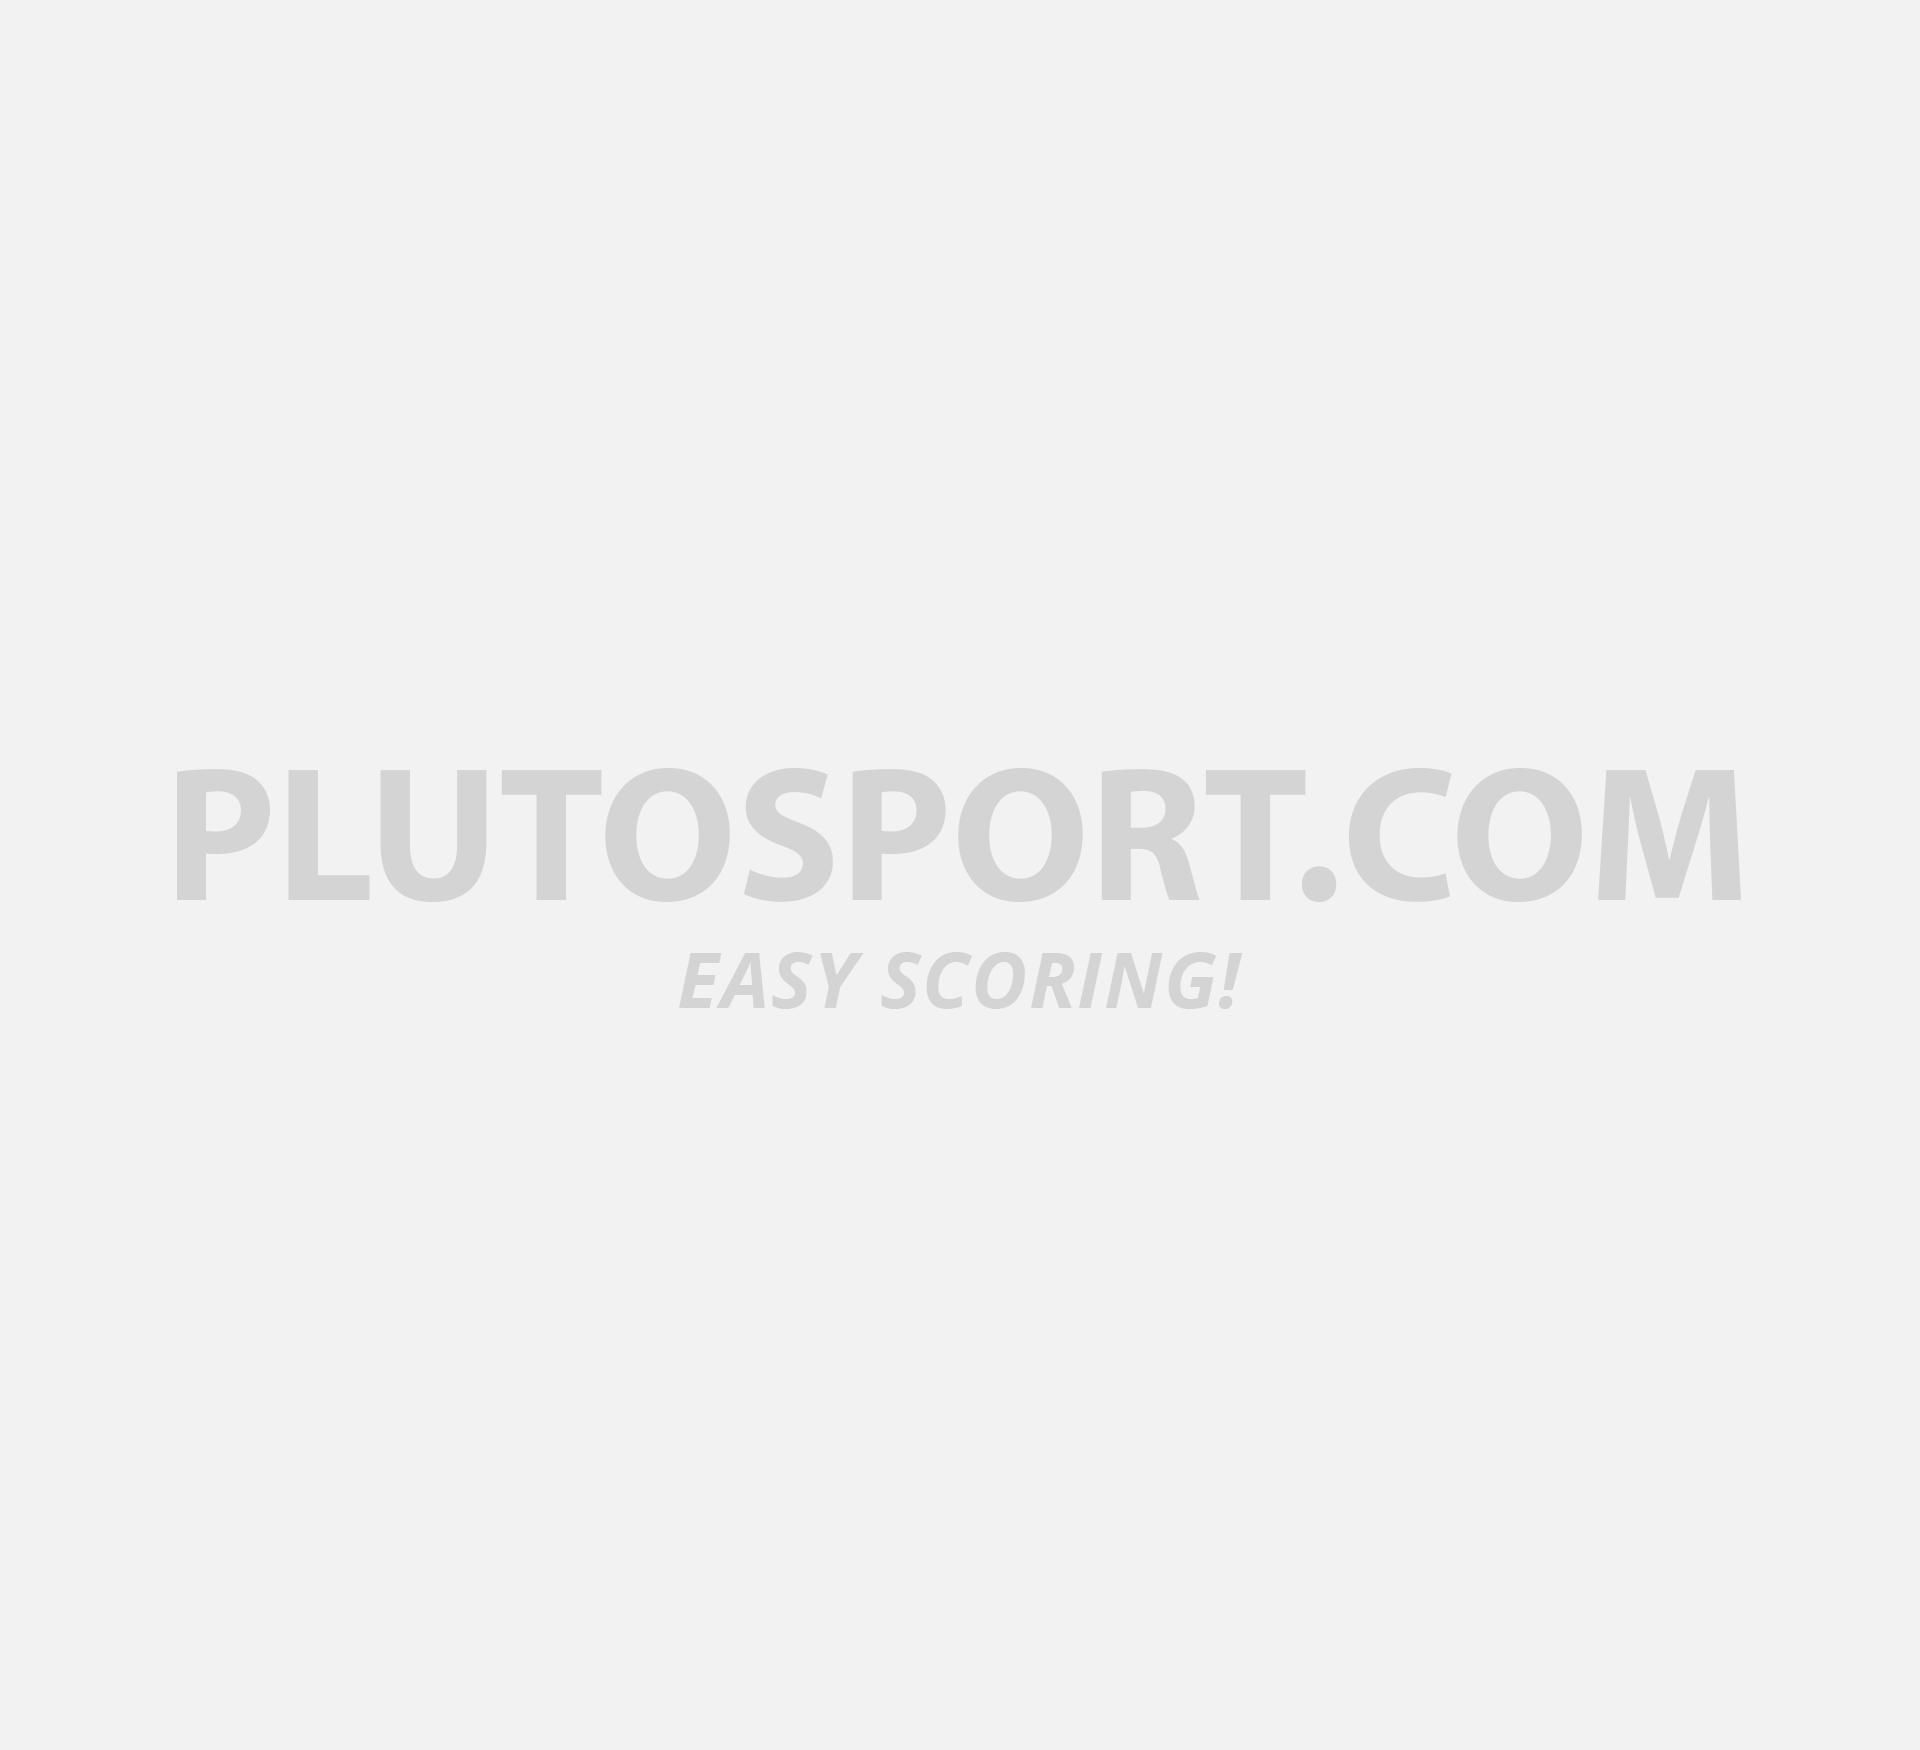 f95d459a333e Nike Benassi JDI Print - Bath slippers - Flip flops - Shoes - Lifestyle -  Sports